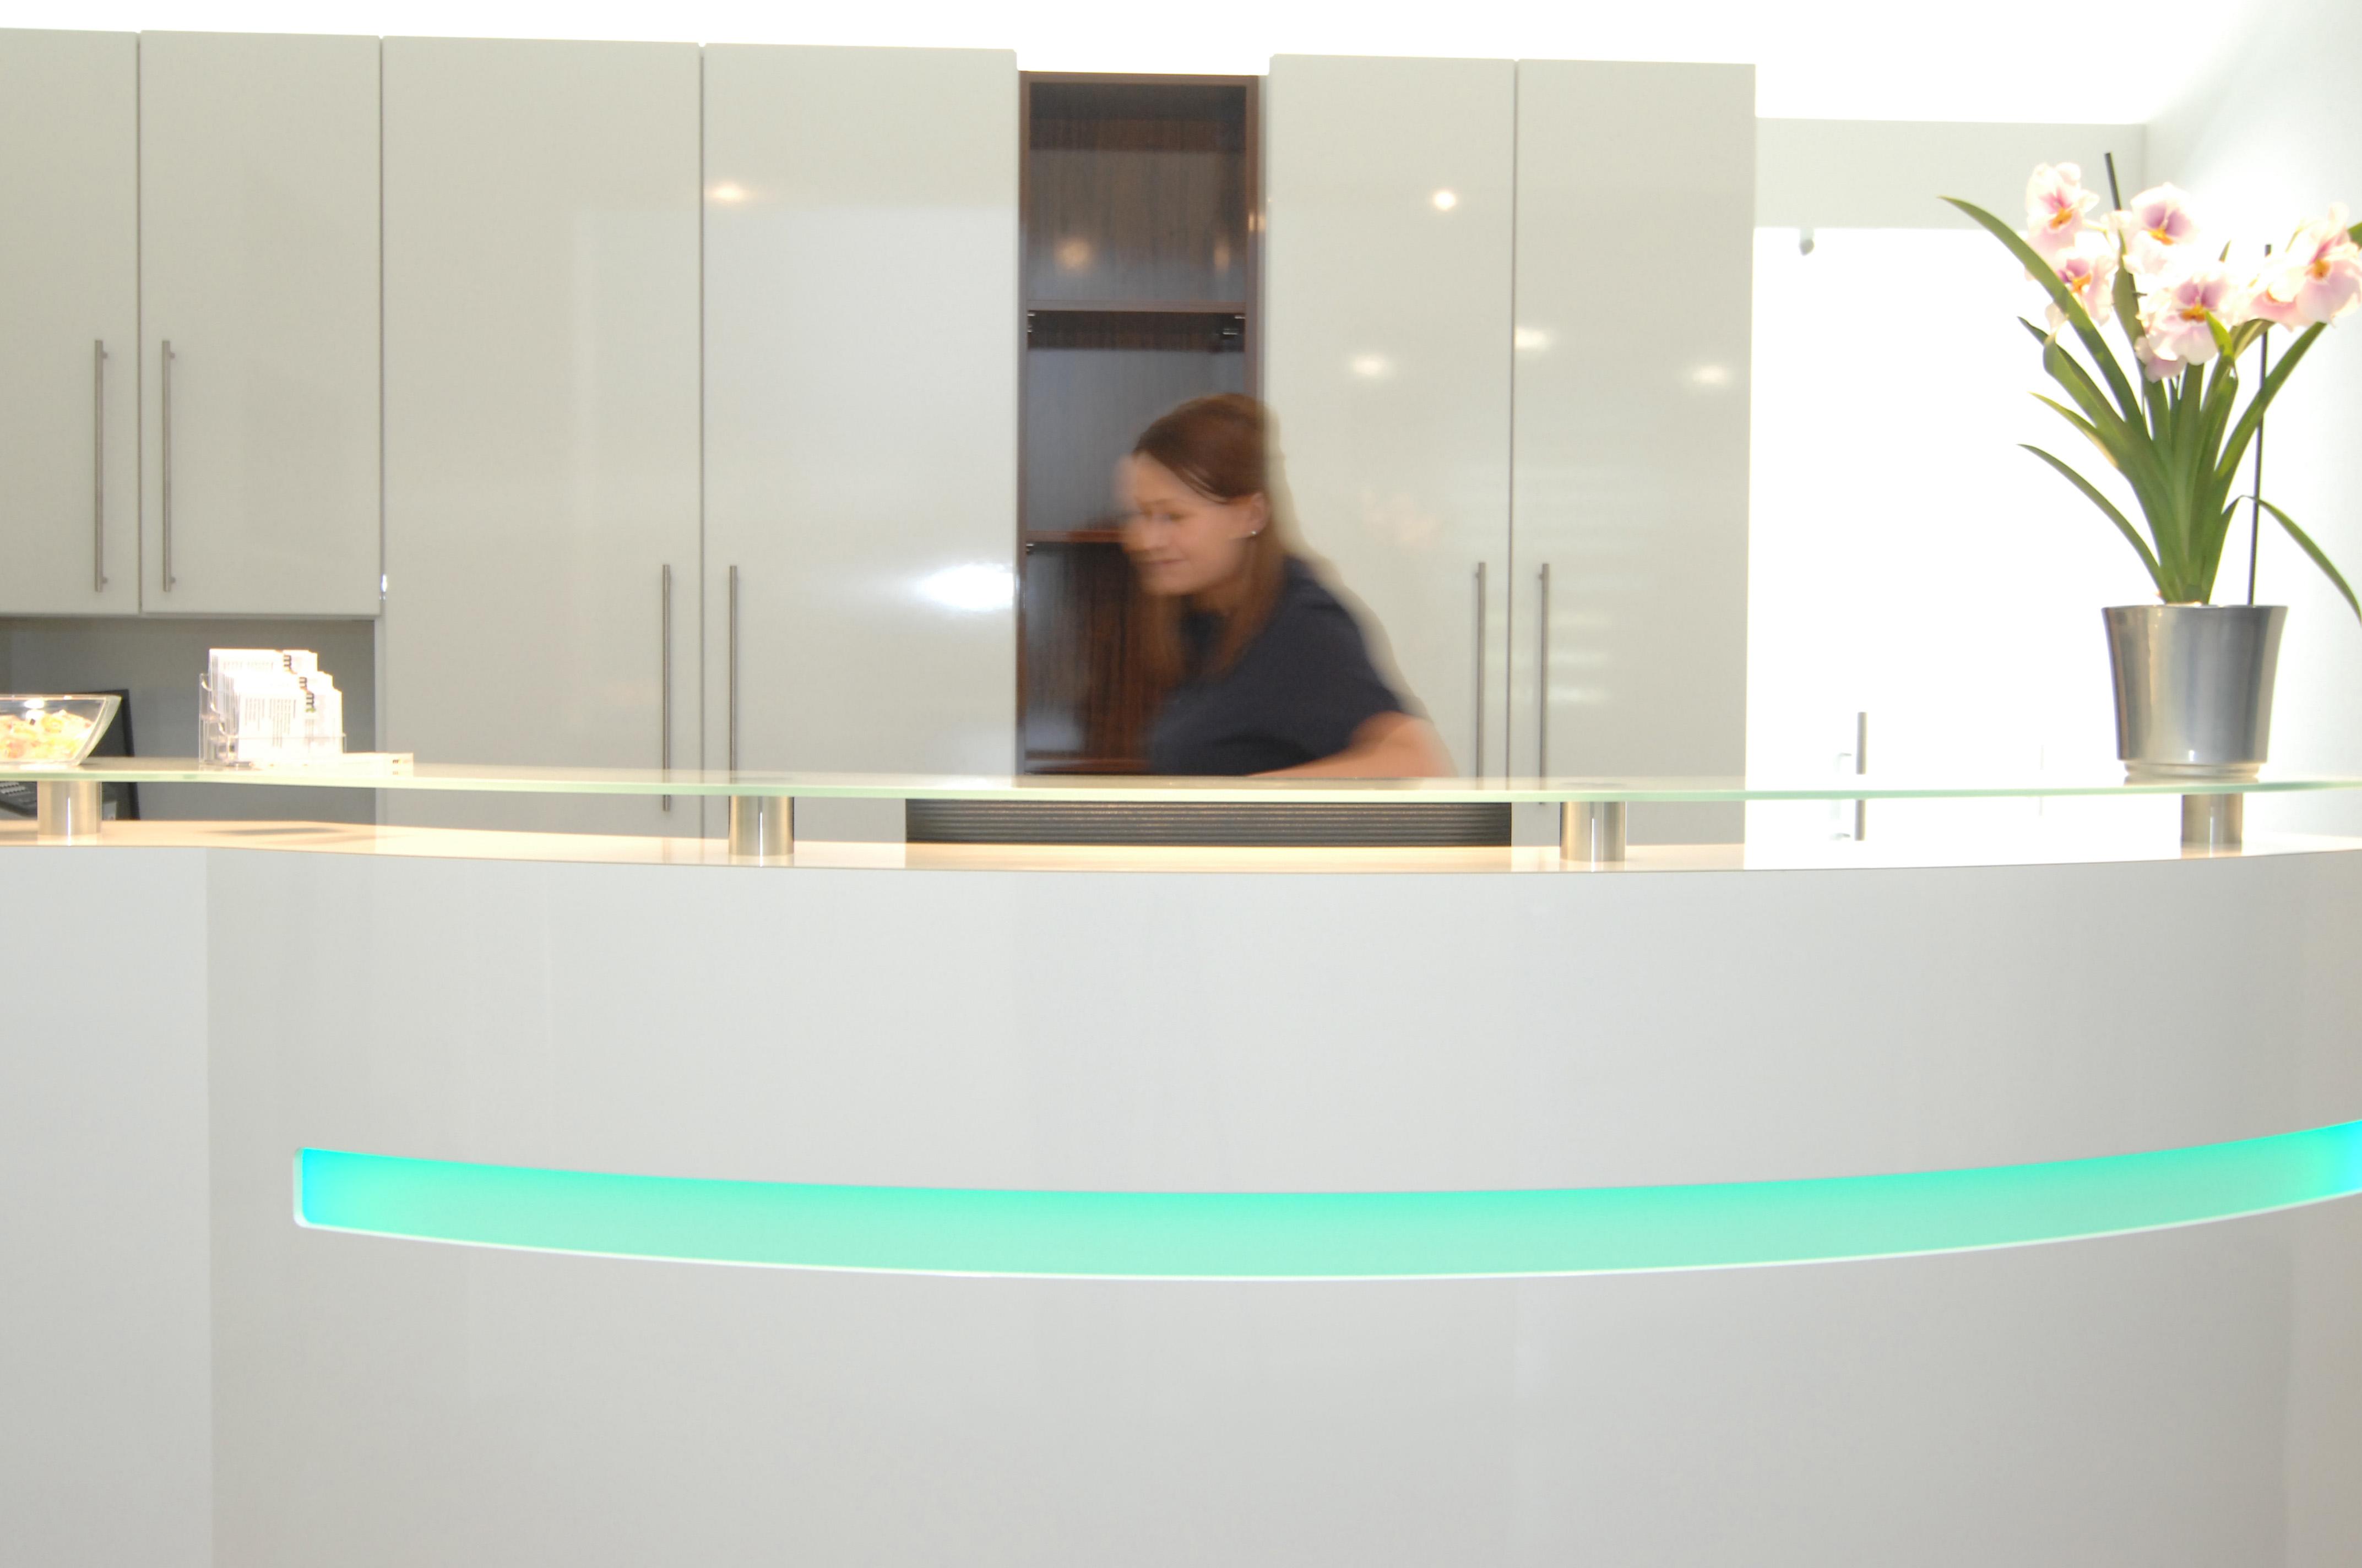 Radiologie MRT Mainz